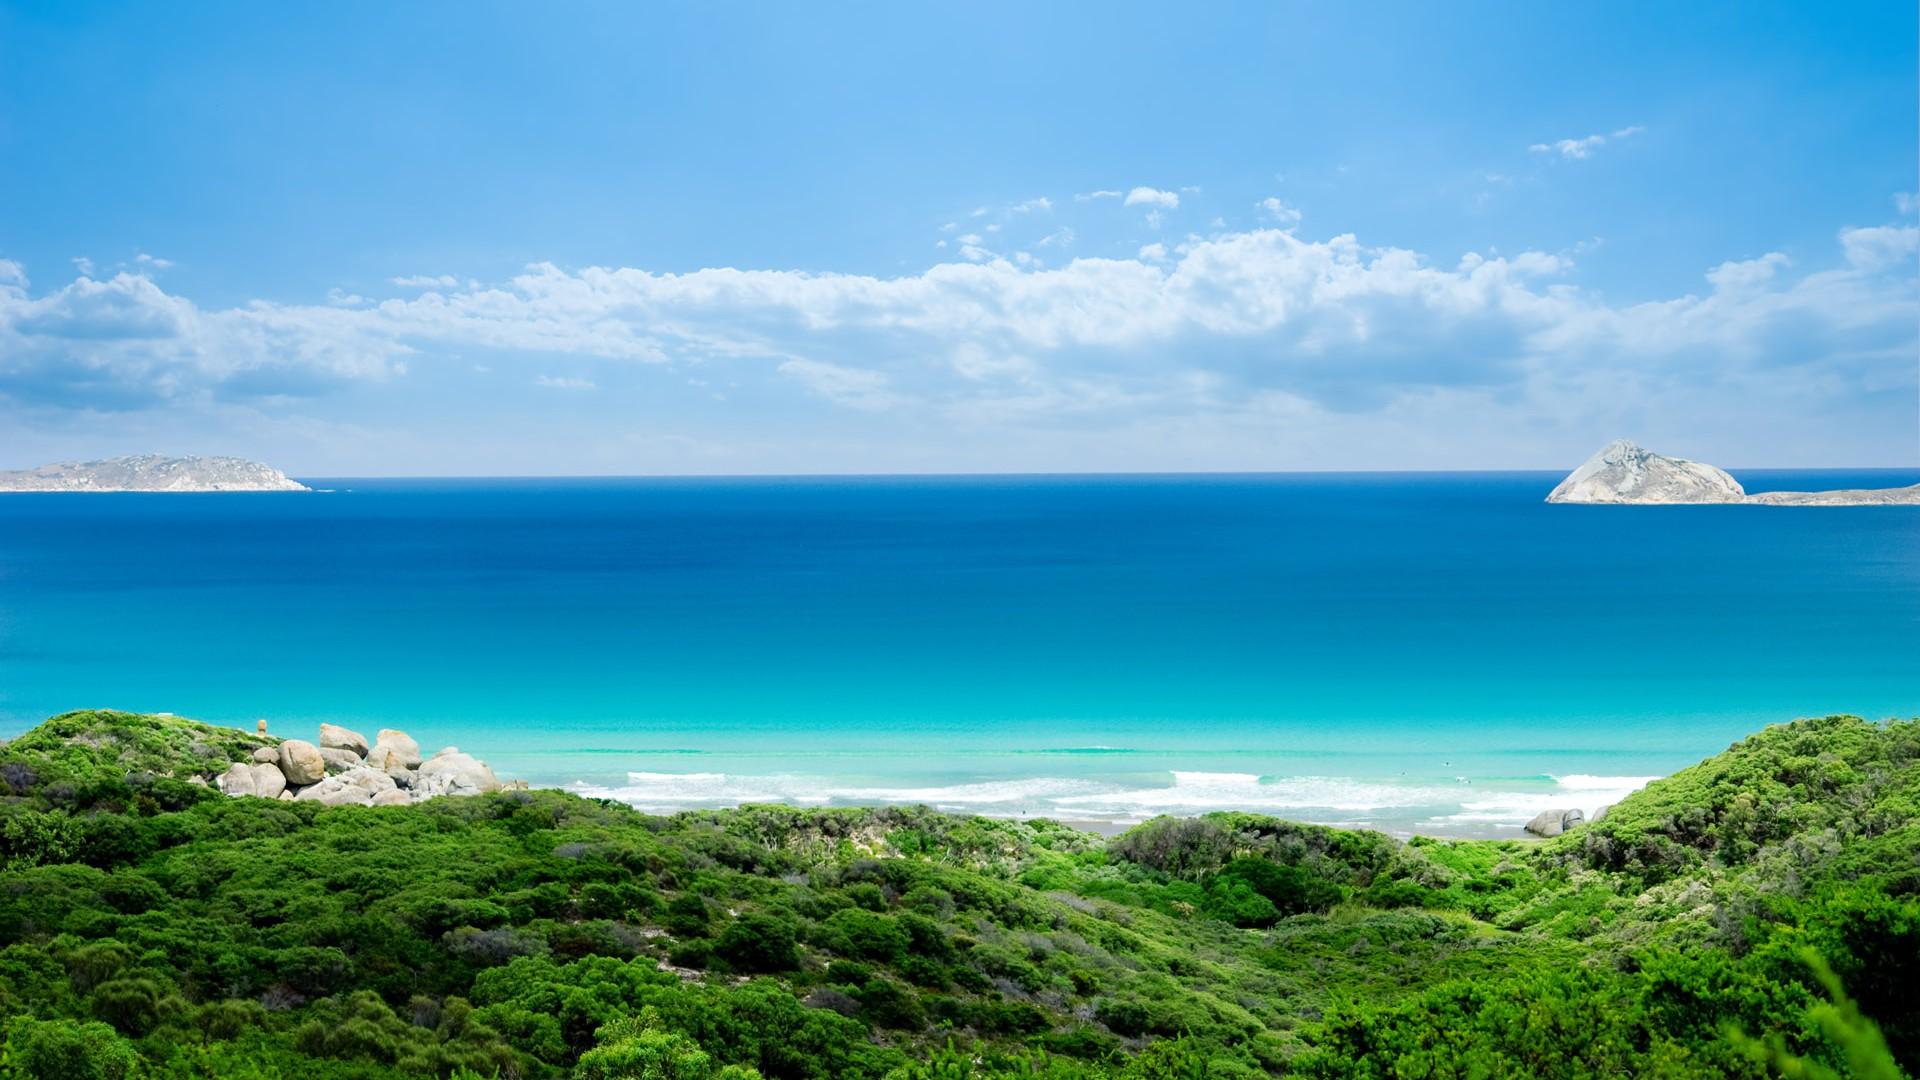 the beautiful seaside scenery - photo #2